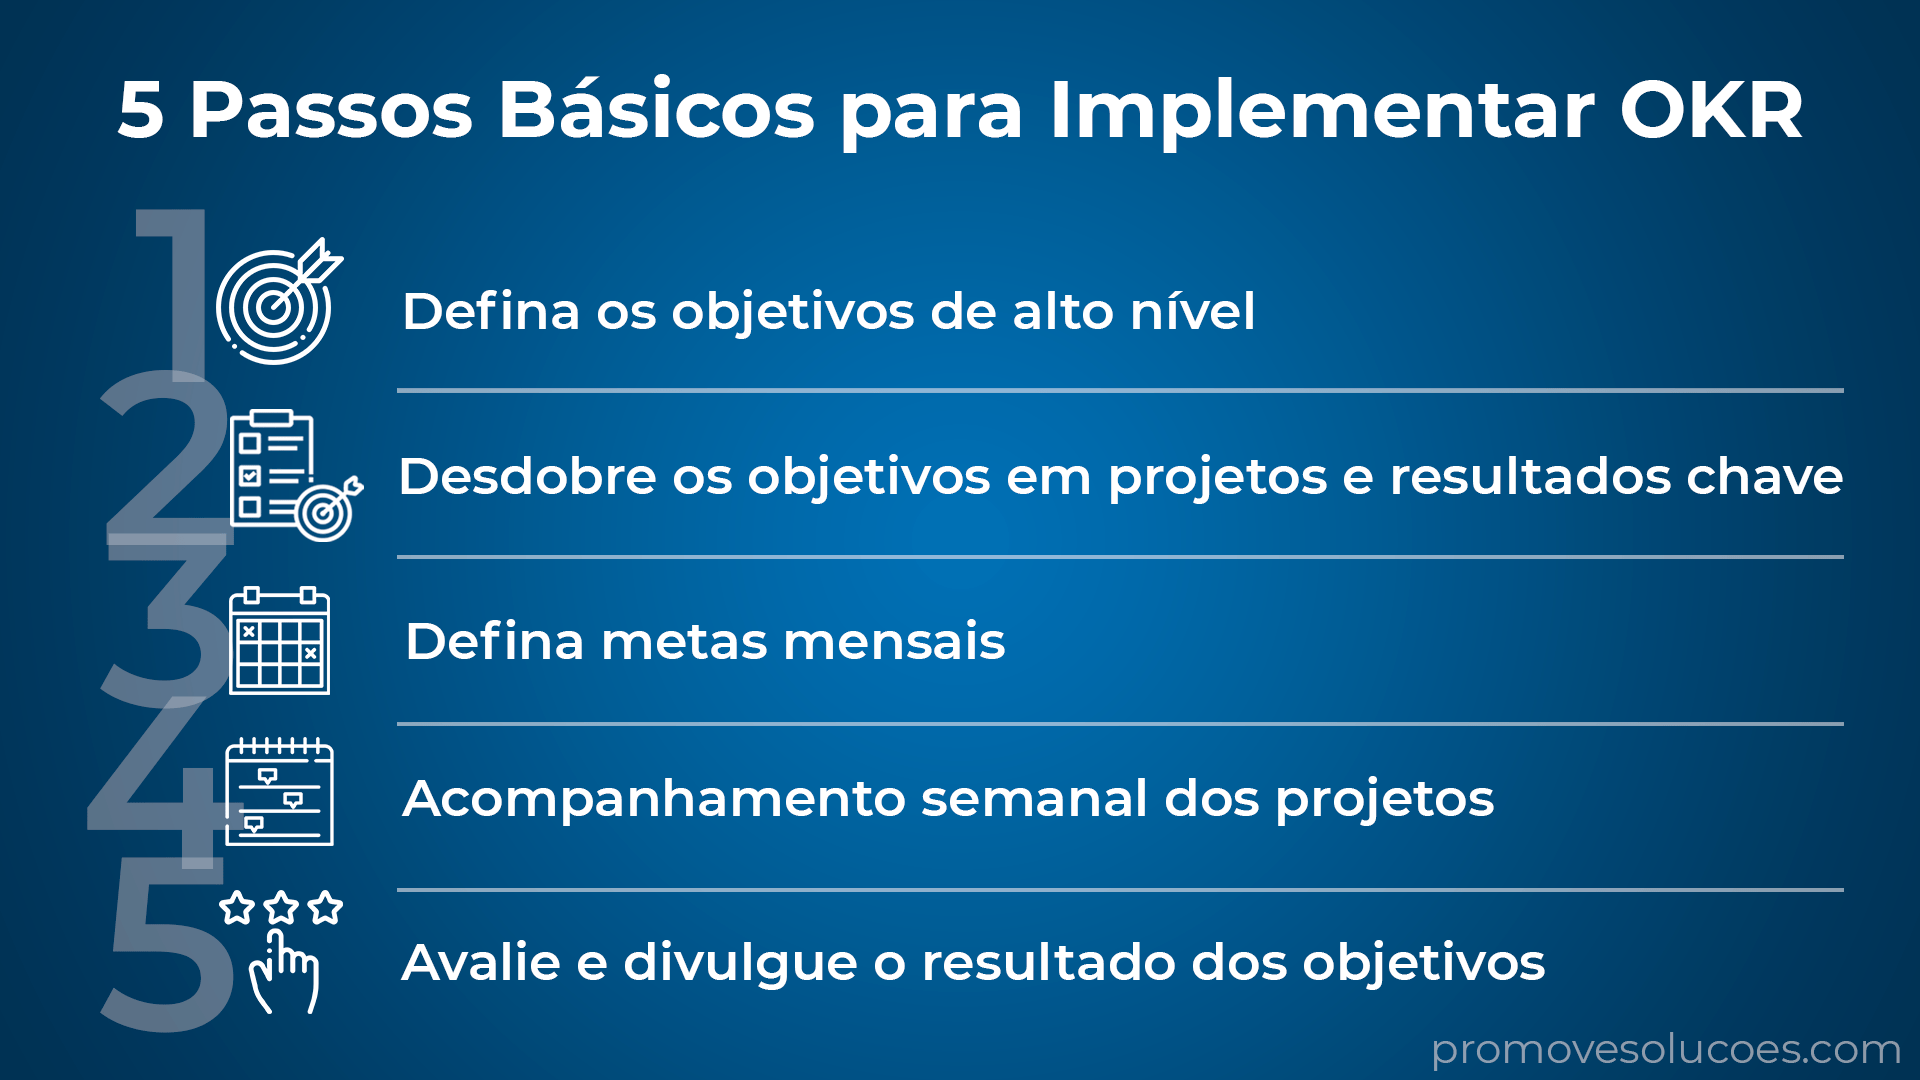 5 Passos Básicos para Implementar OKR